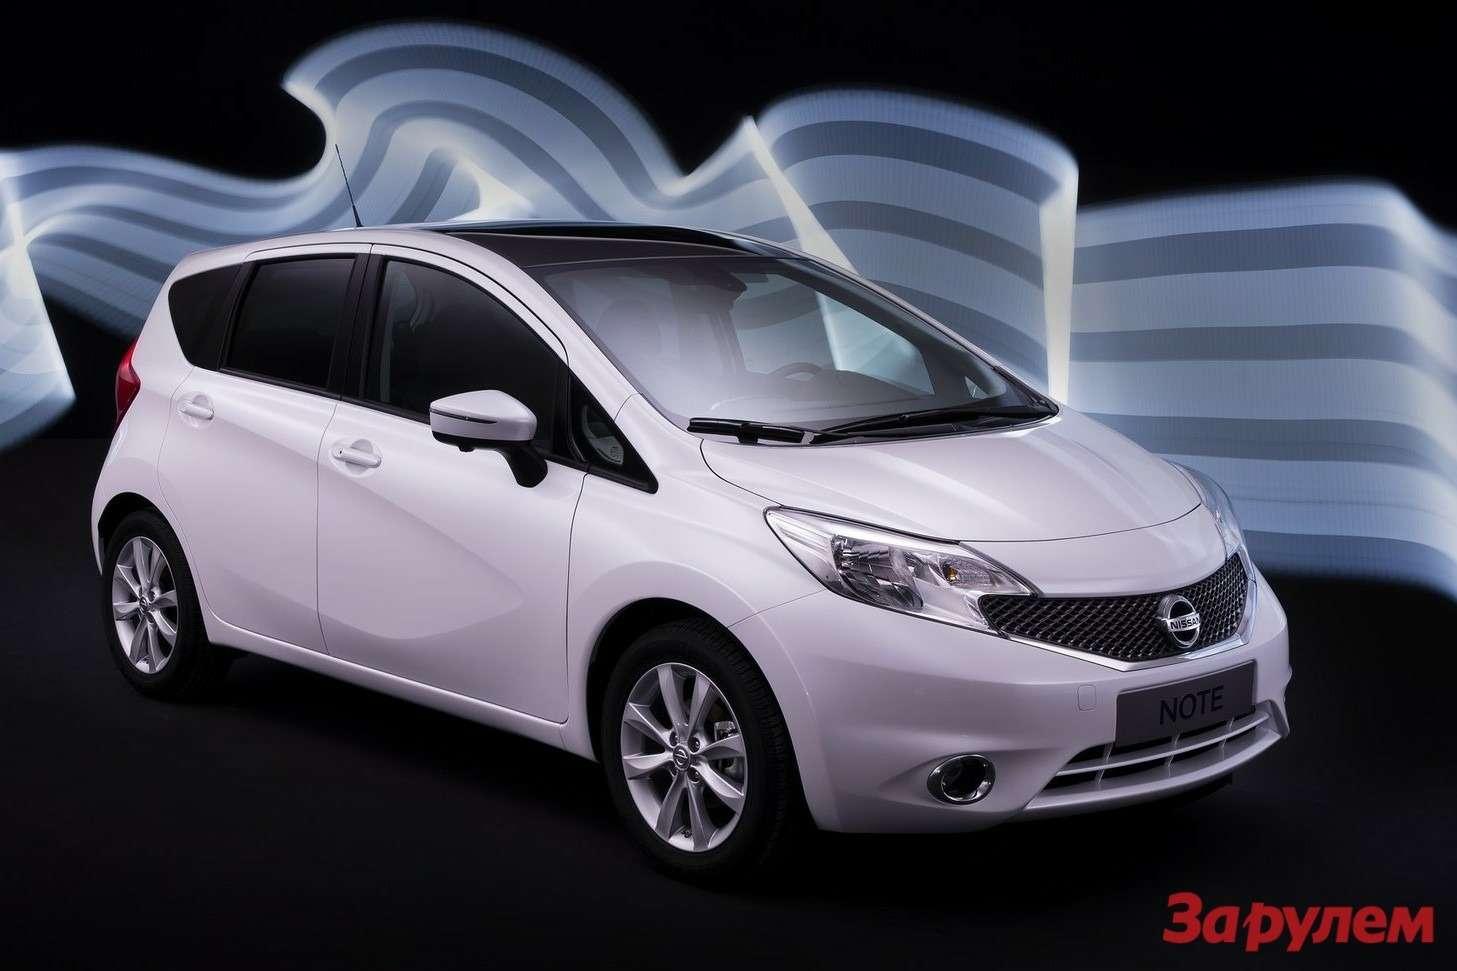 Nissan-Note_2014_1600x1200_wallpaper_02